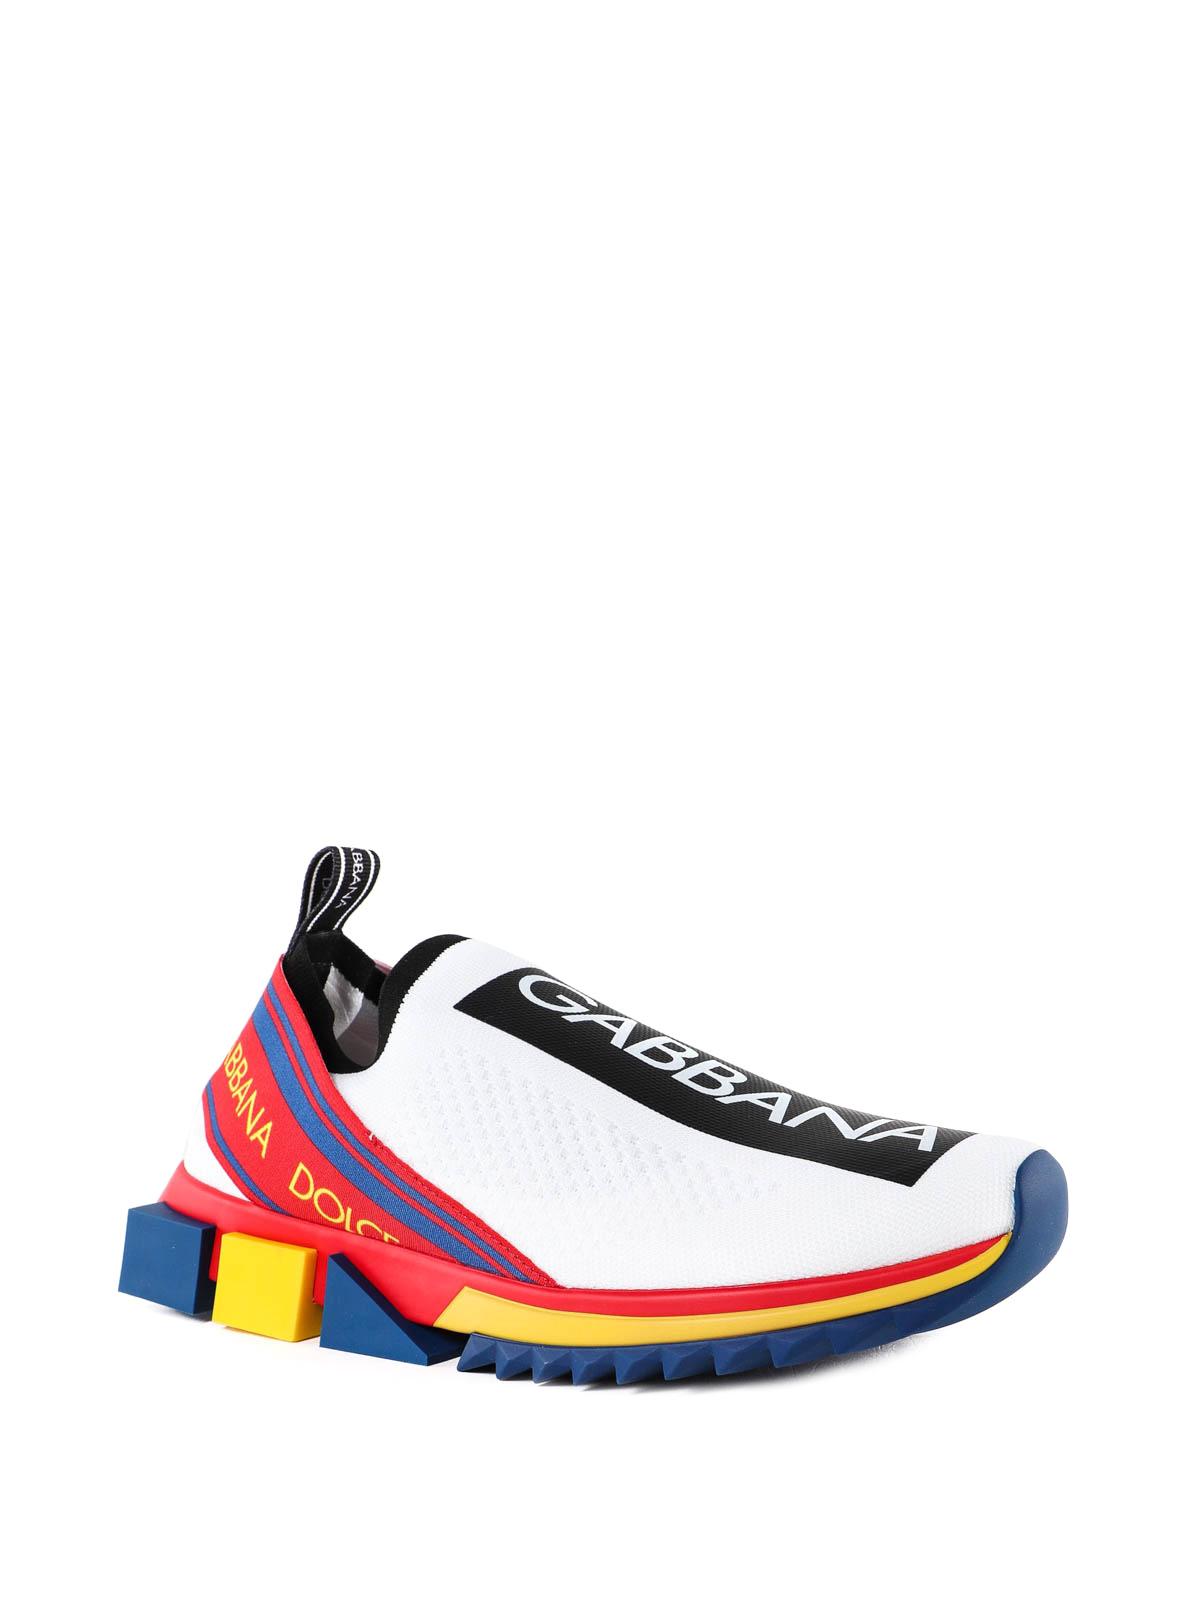 Dolce \u0026 Gabbana - Sorrento multicolour